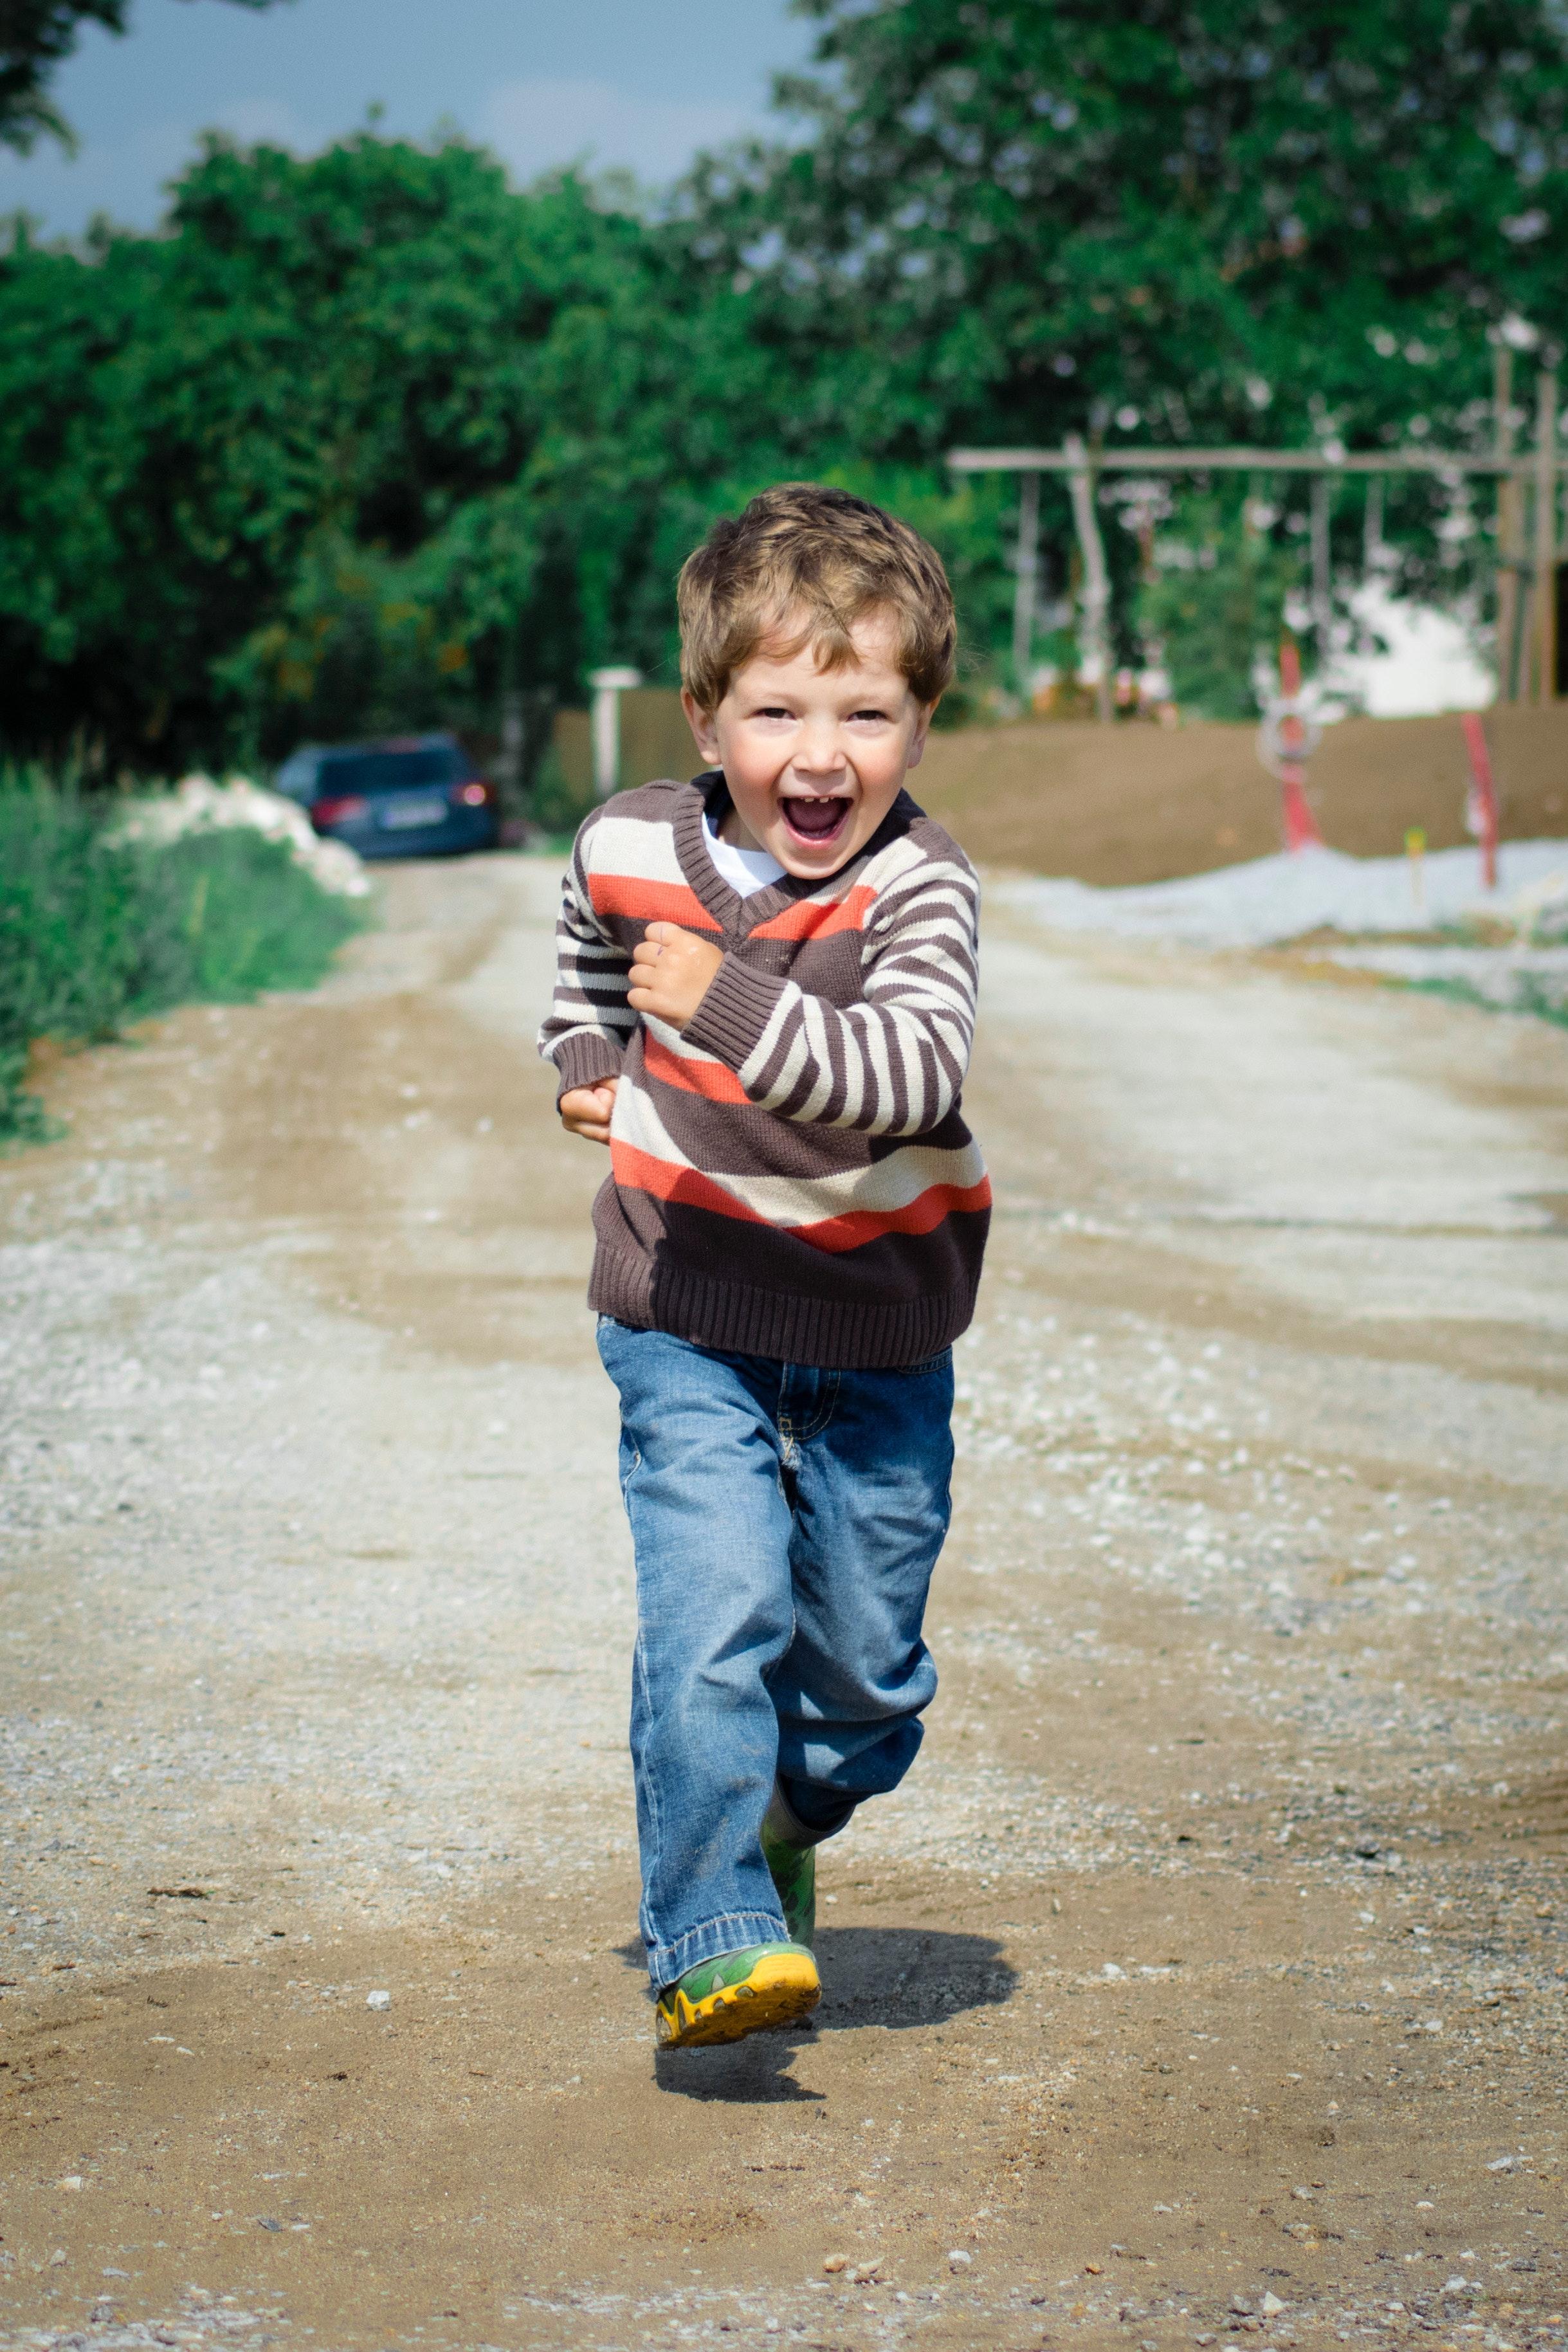 adorable-boy-child-1104007.jpg